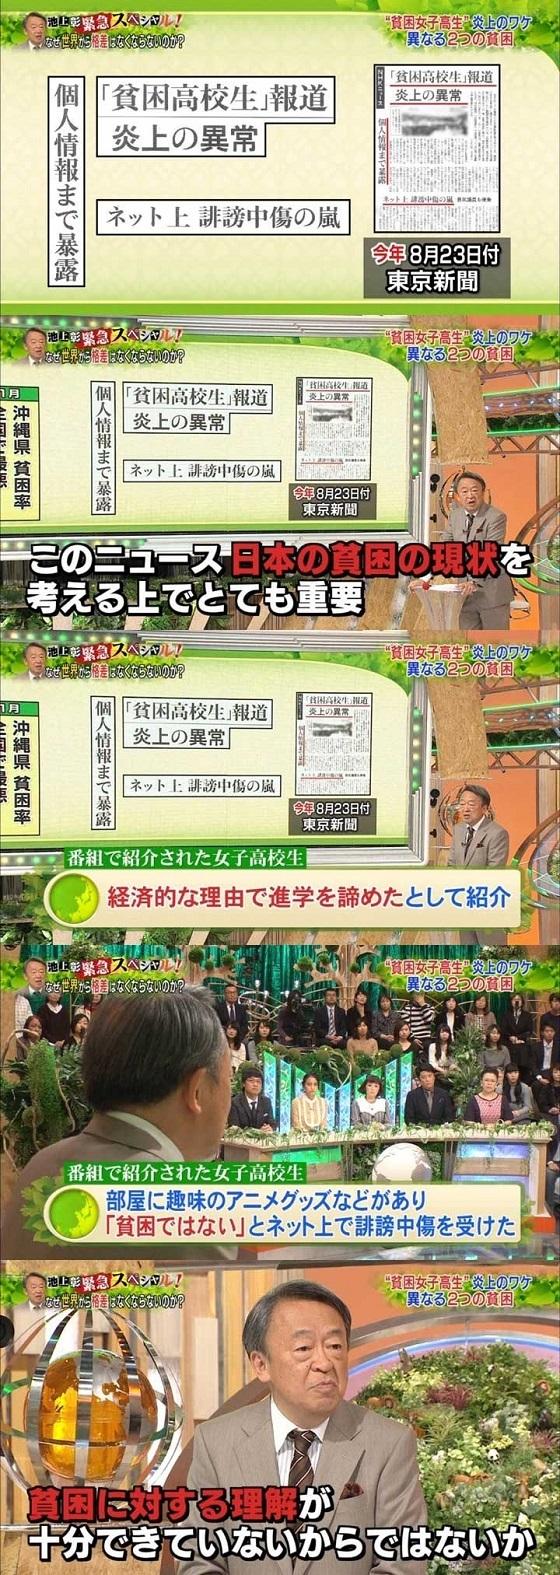 NHKニュースが捏造!PC買えず千円キーボードの貧困女子高生、実は高額ペンを持ち、趣味に散財・「うららさん」こと杉山麗も嘘を吐く